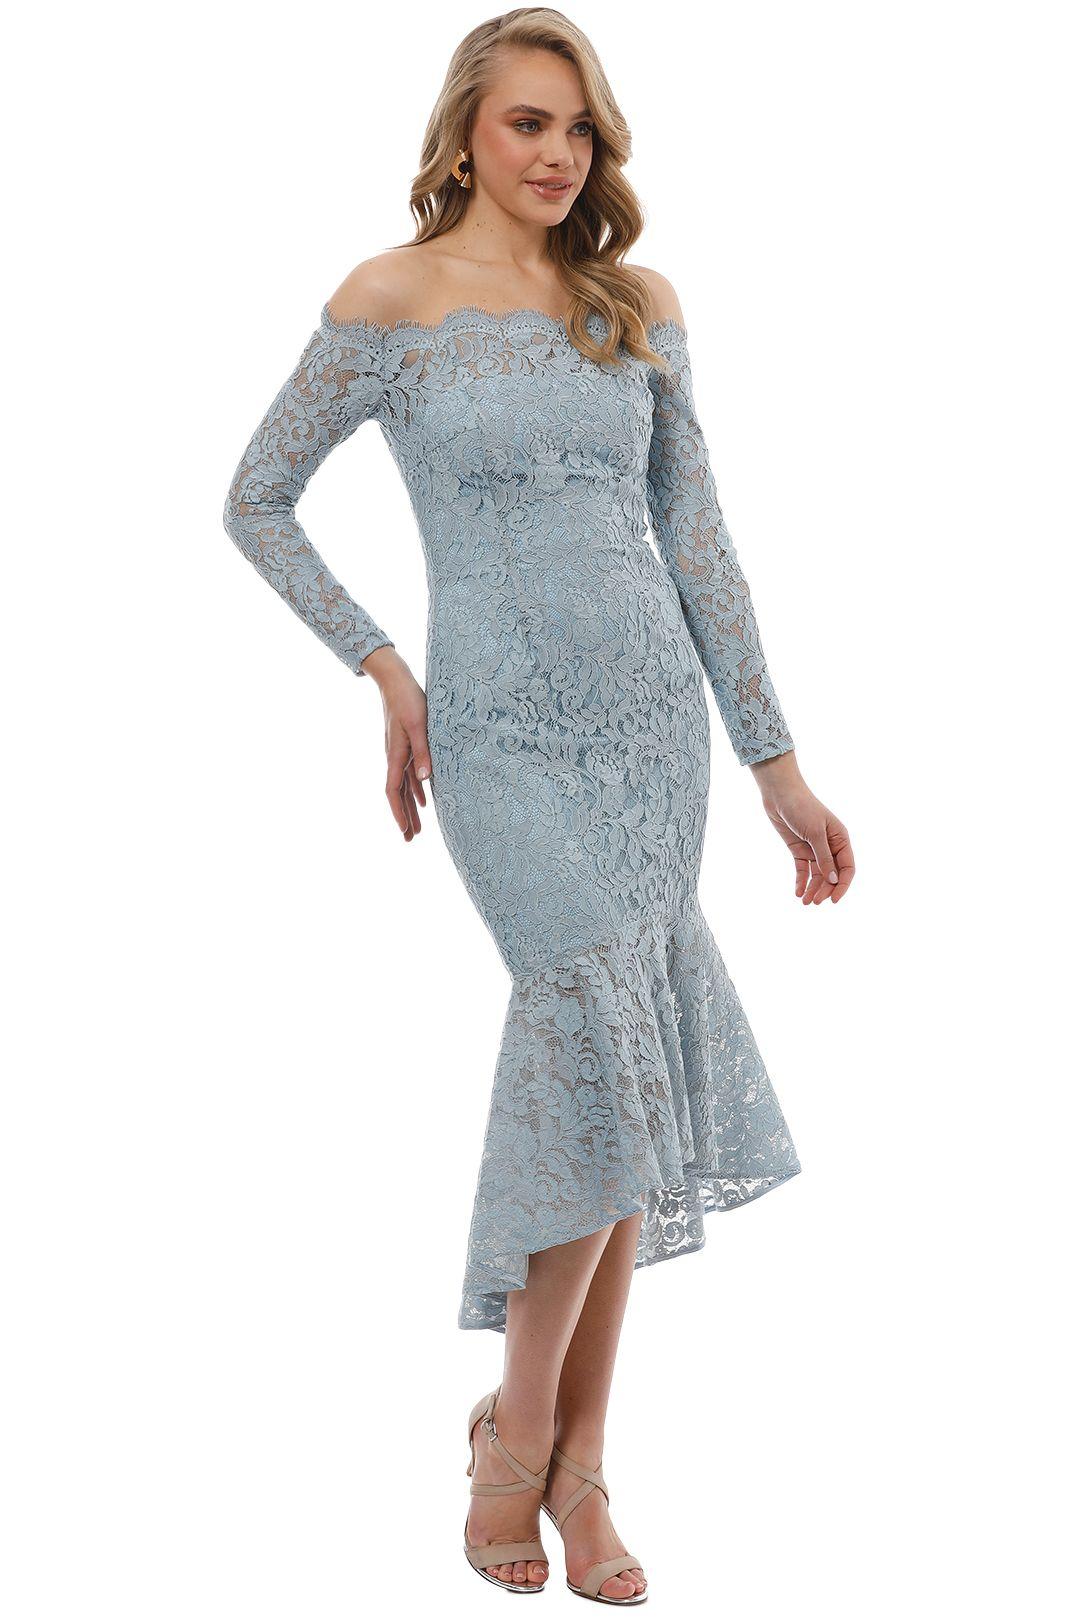 Rodeo Show - Abella Lace Dress - Blue - Side